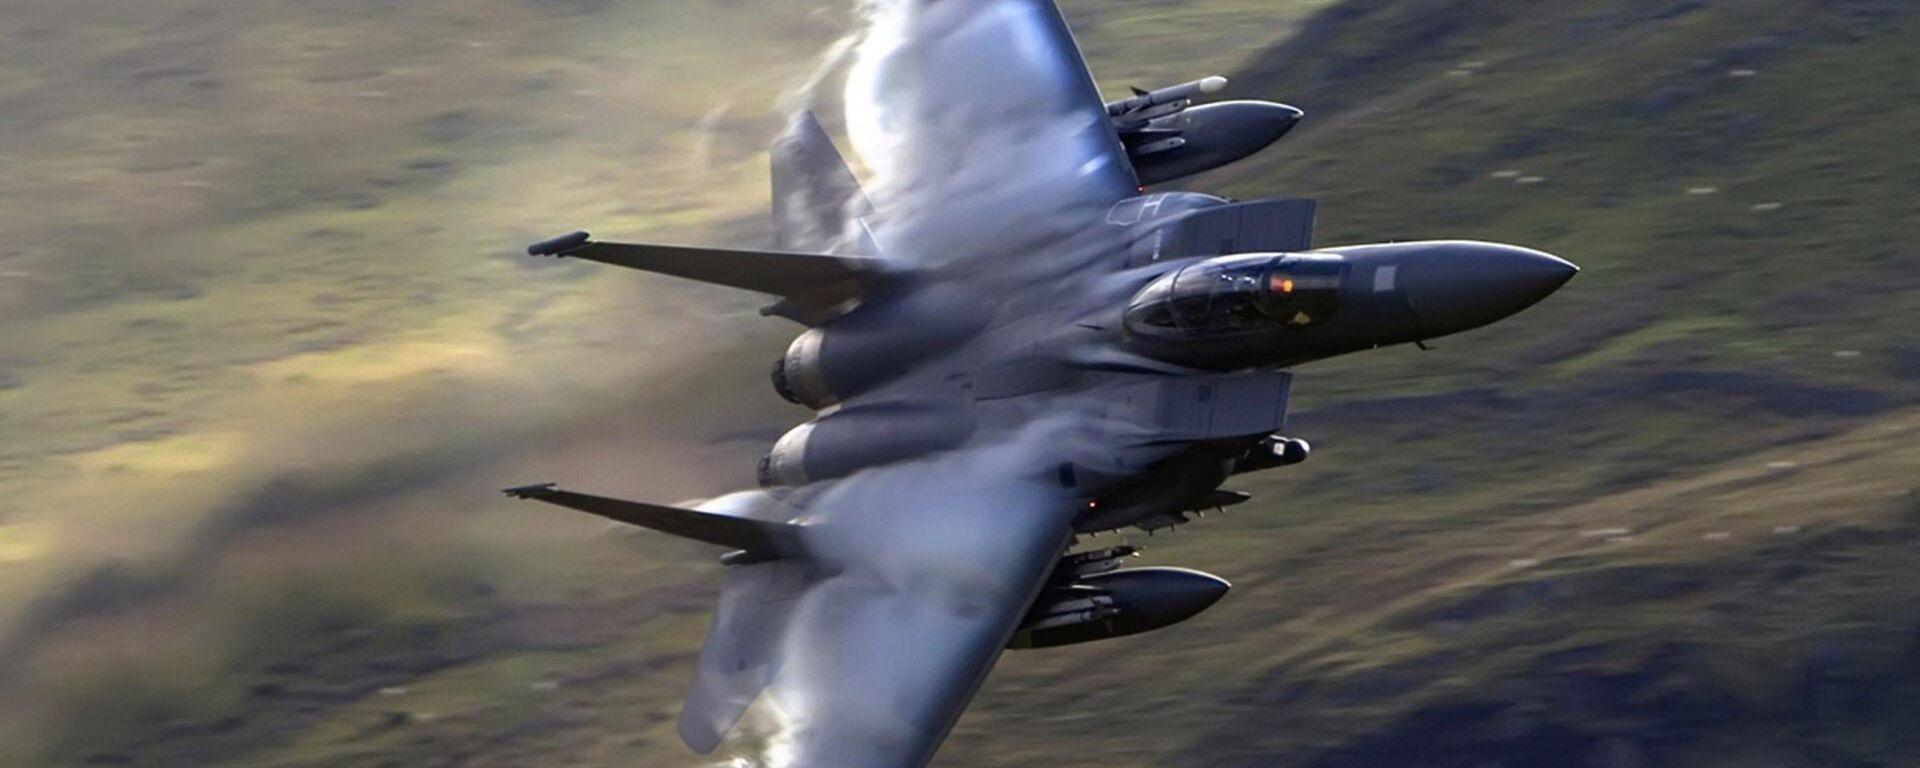 Un caza F-15 (imagen referencial) - Sputnik Mundo, 1920, 09.02.2021